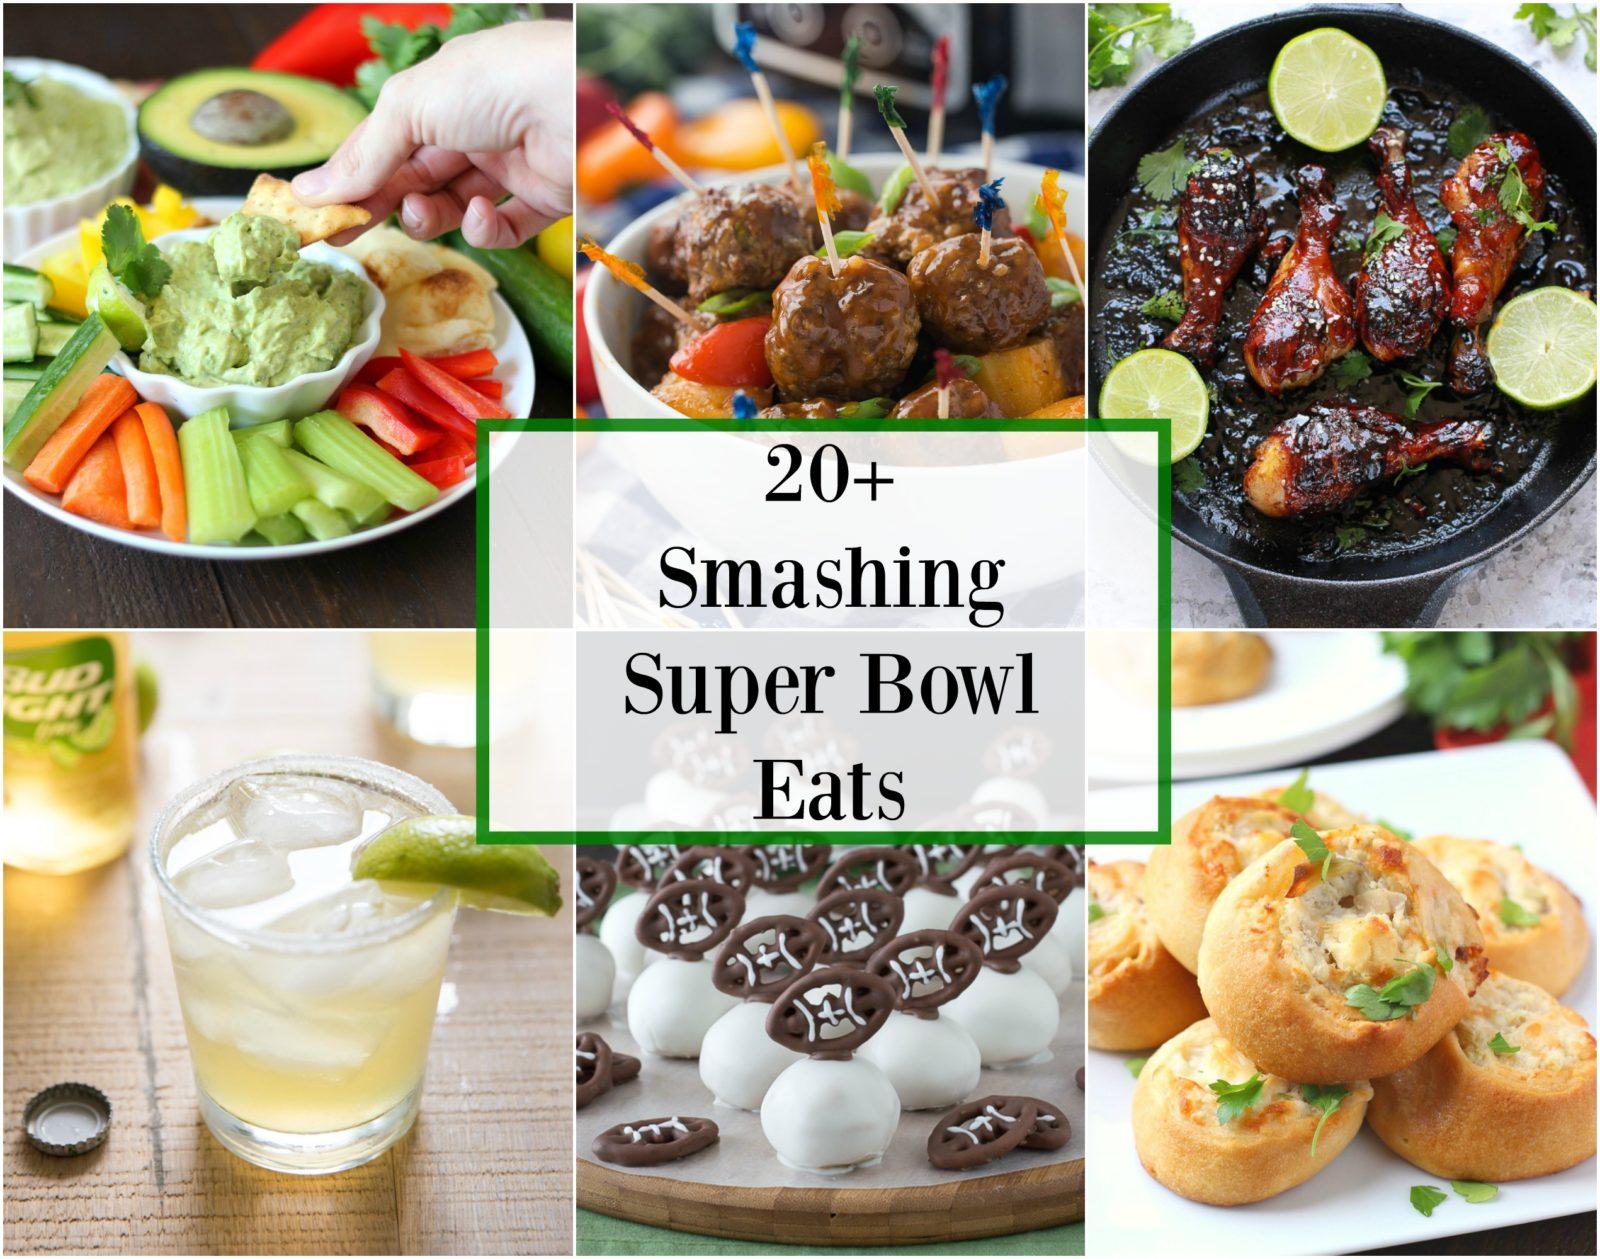 20+ Smashing Super Bowl Eats